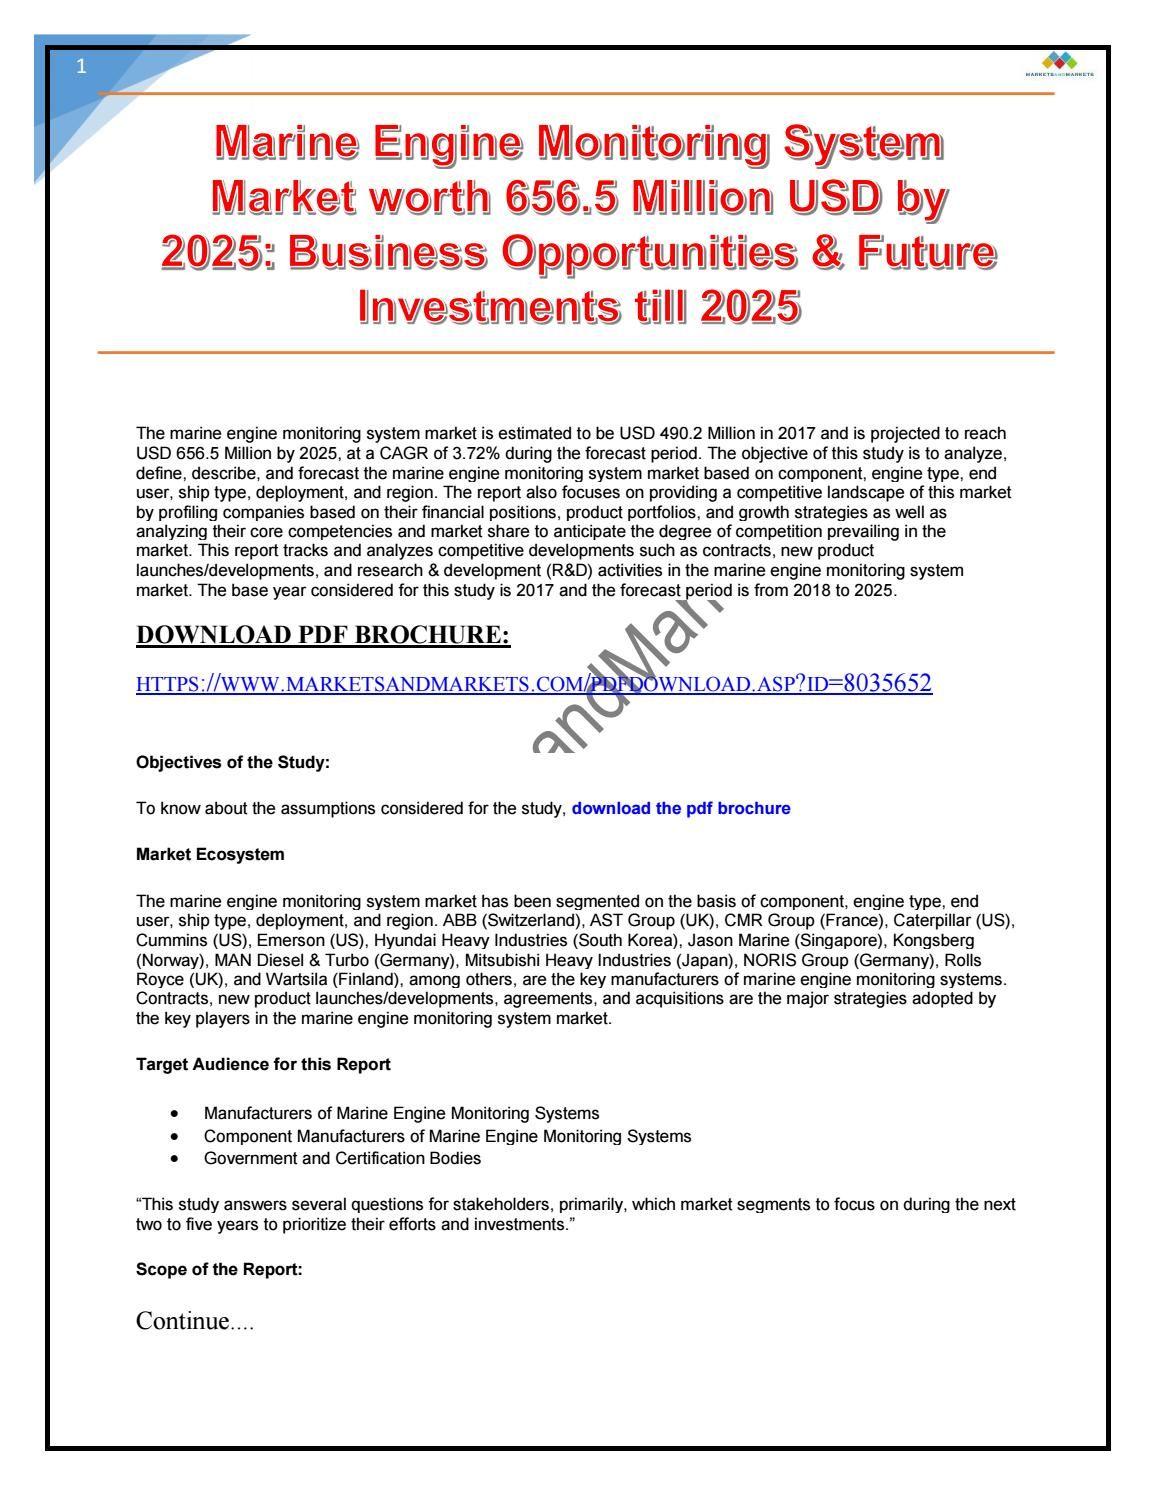 Marine Engine Monitoring System Market Worth 656 5 Million Usd By 2025 Engineering Marketing System